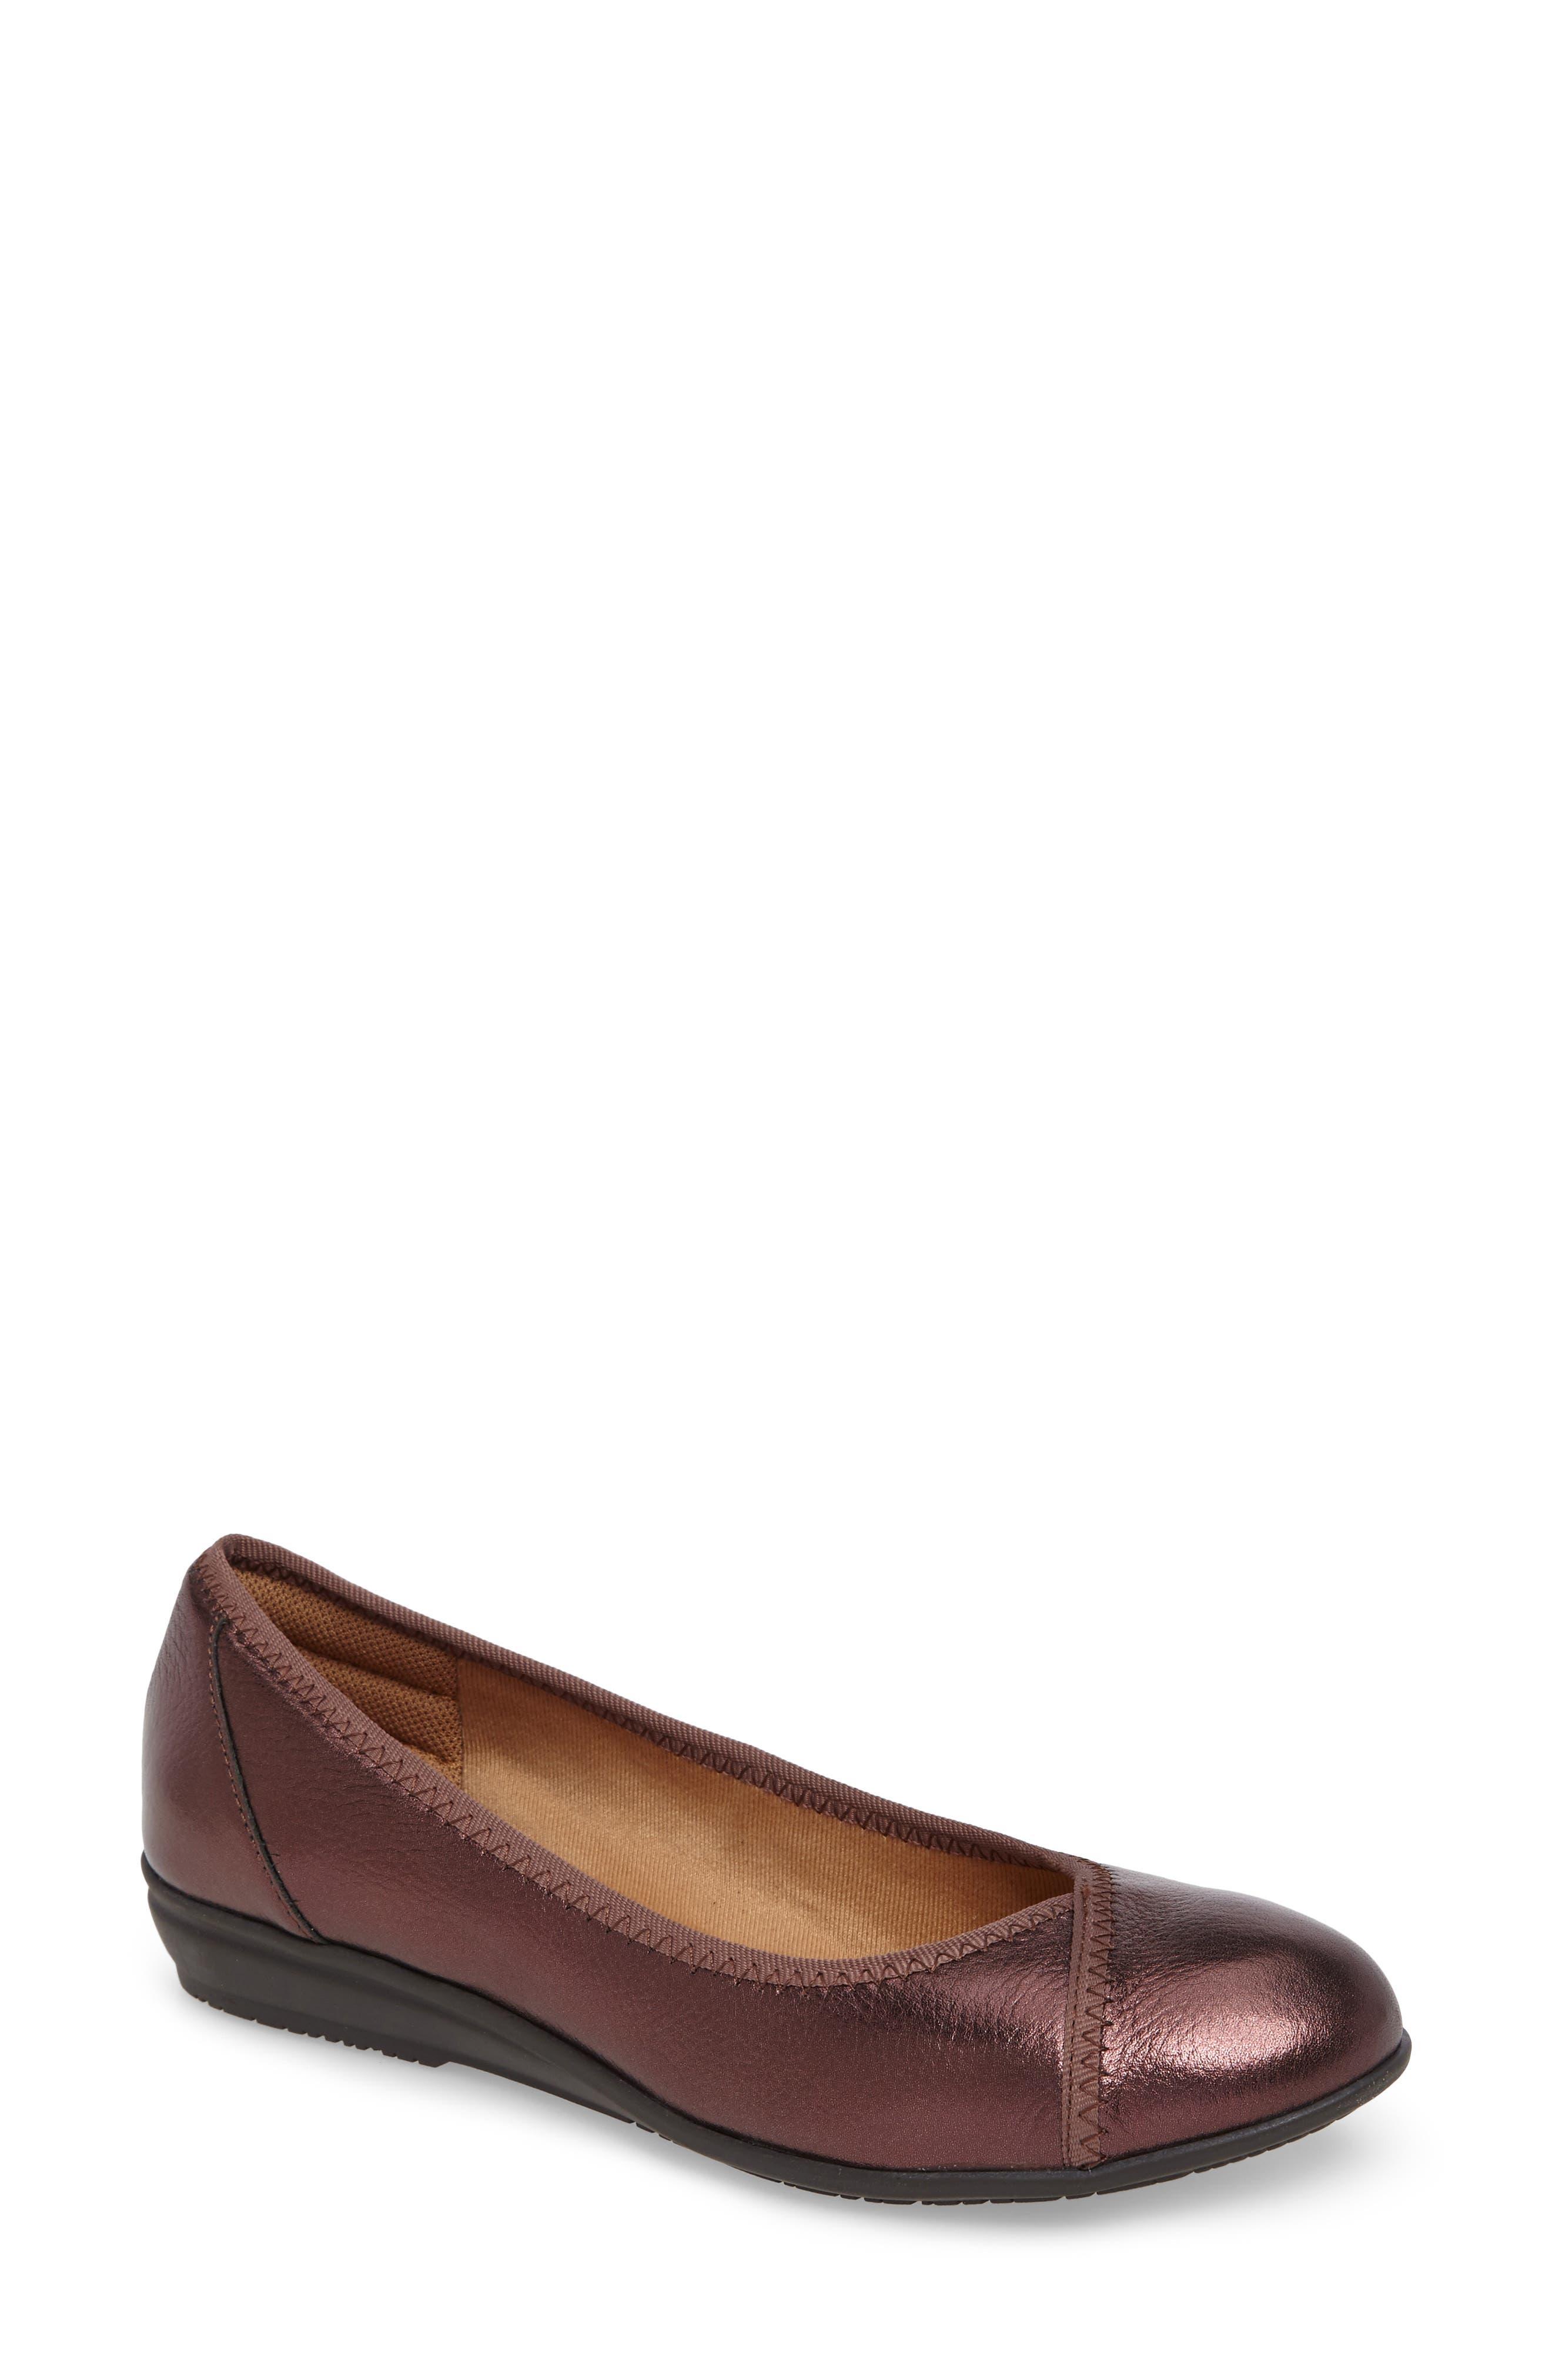 Eaton Flat,                         Main,                         color, Chianti Metallic Leather